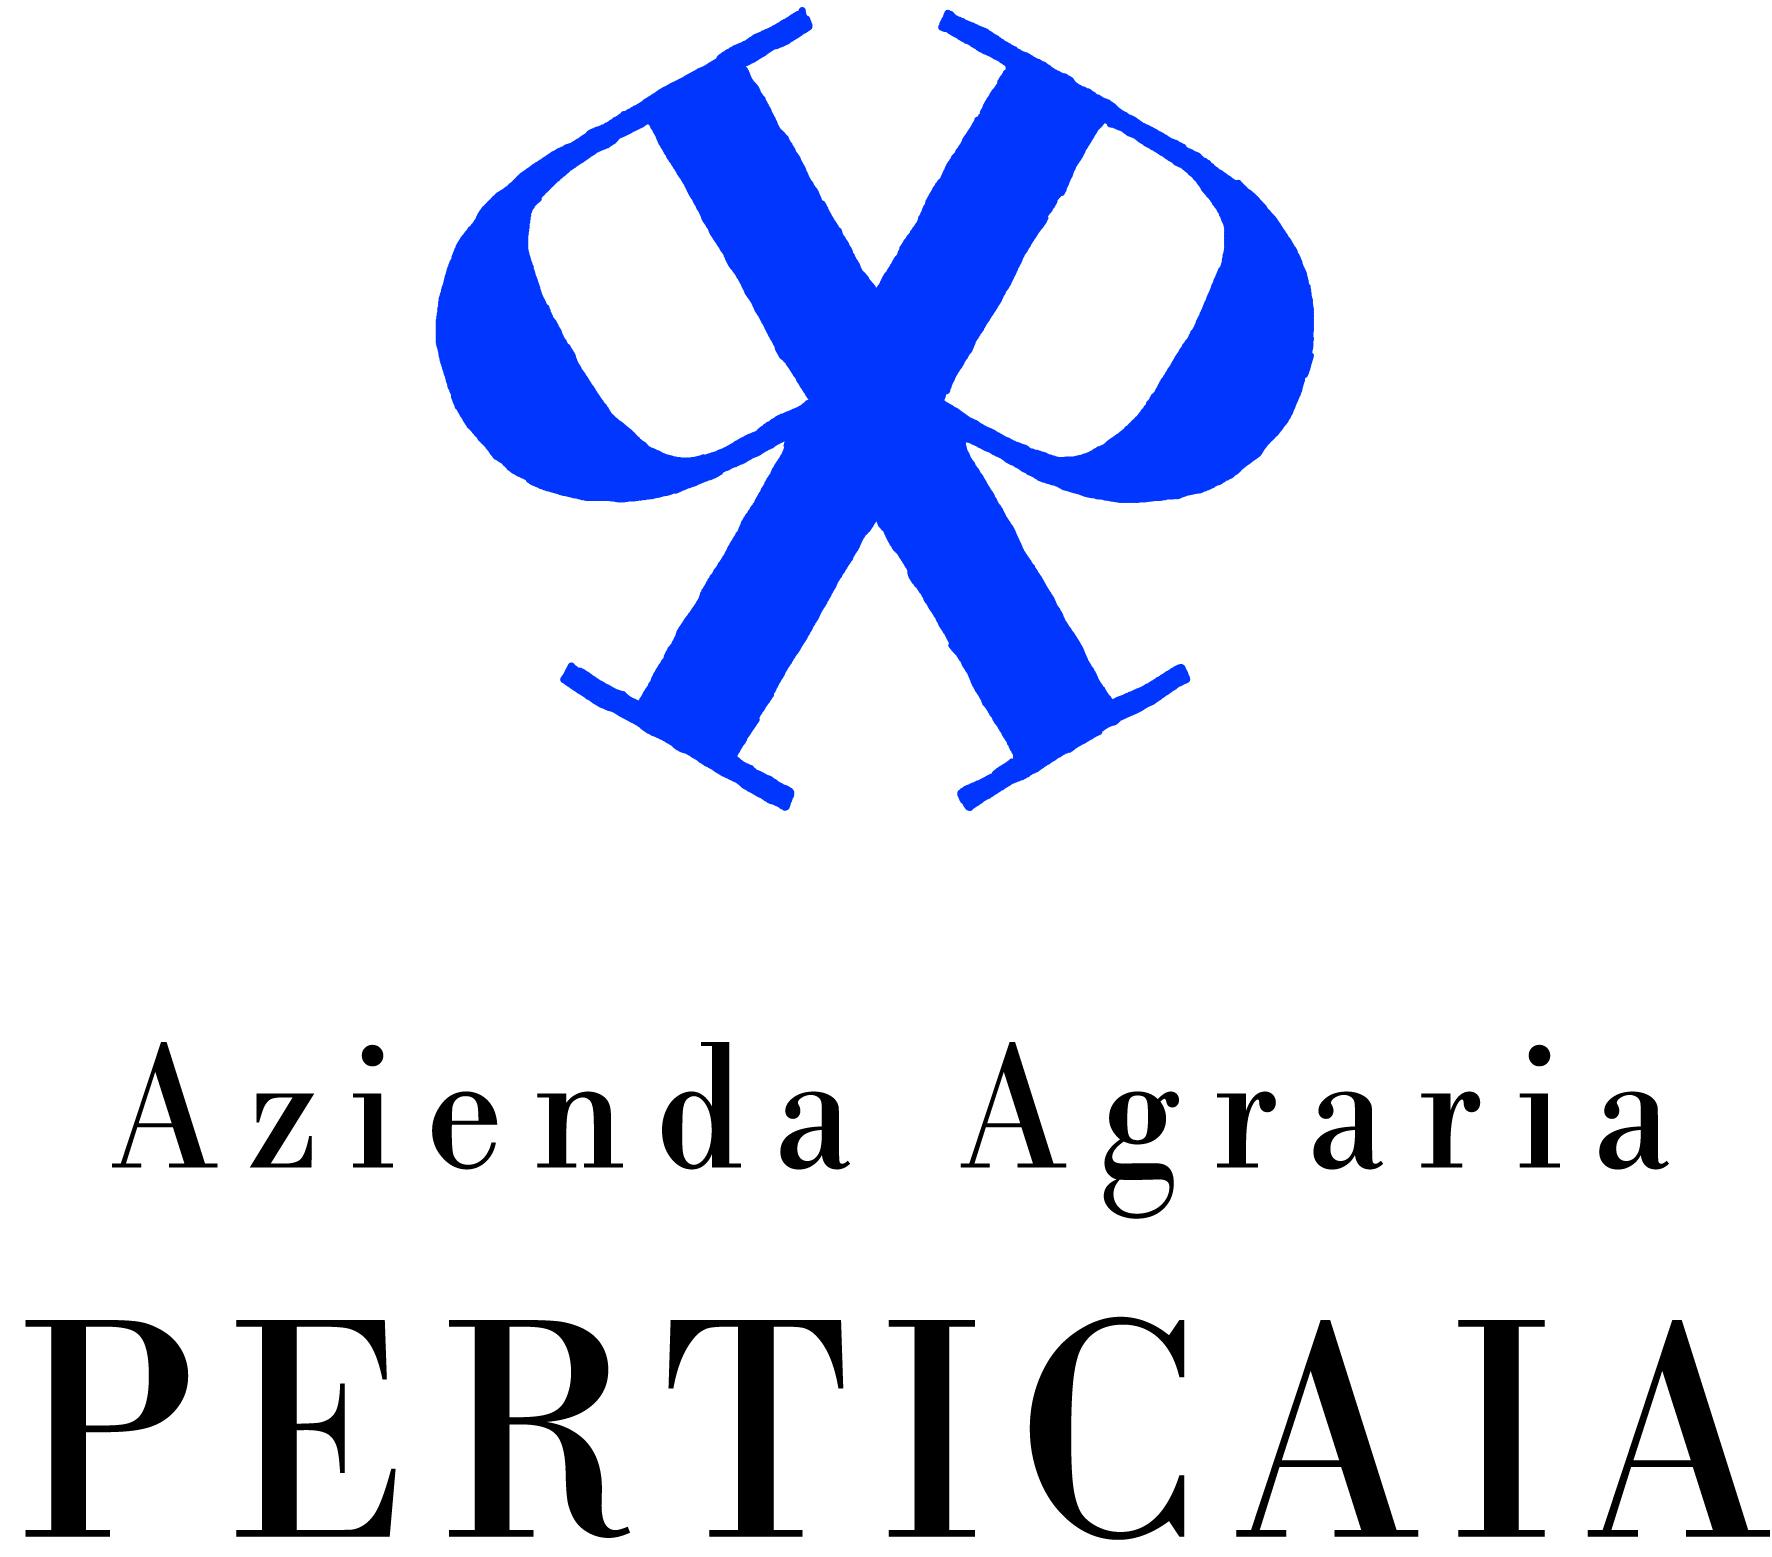 Perticaia